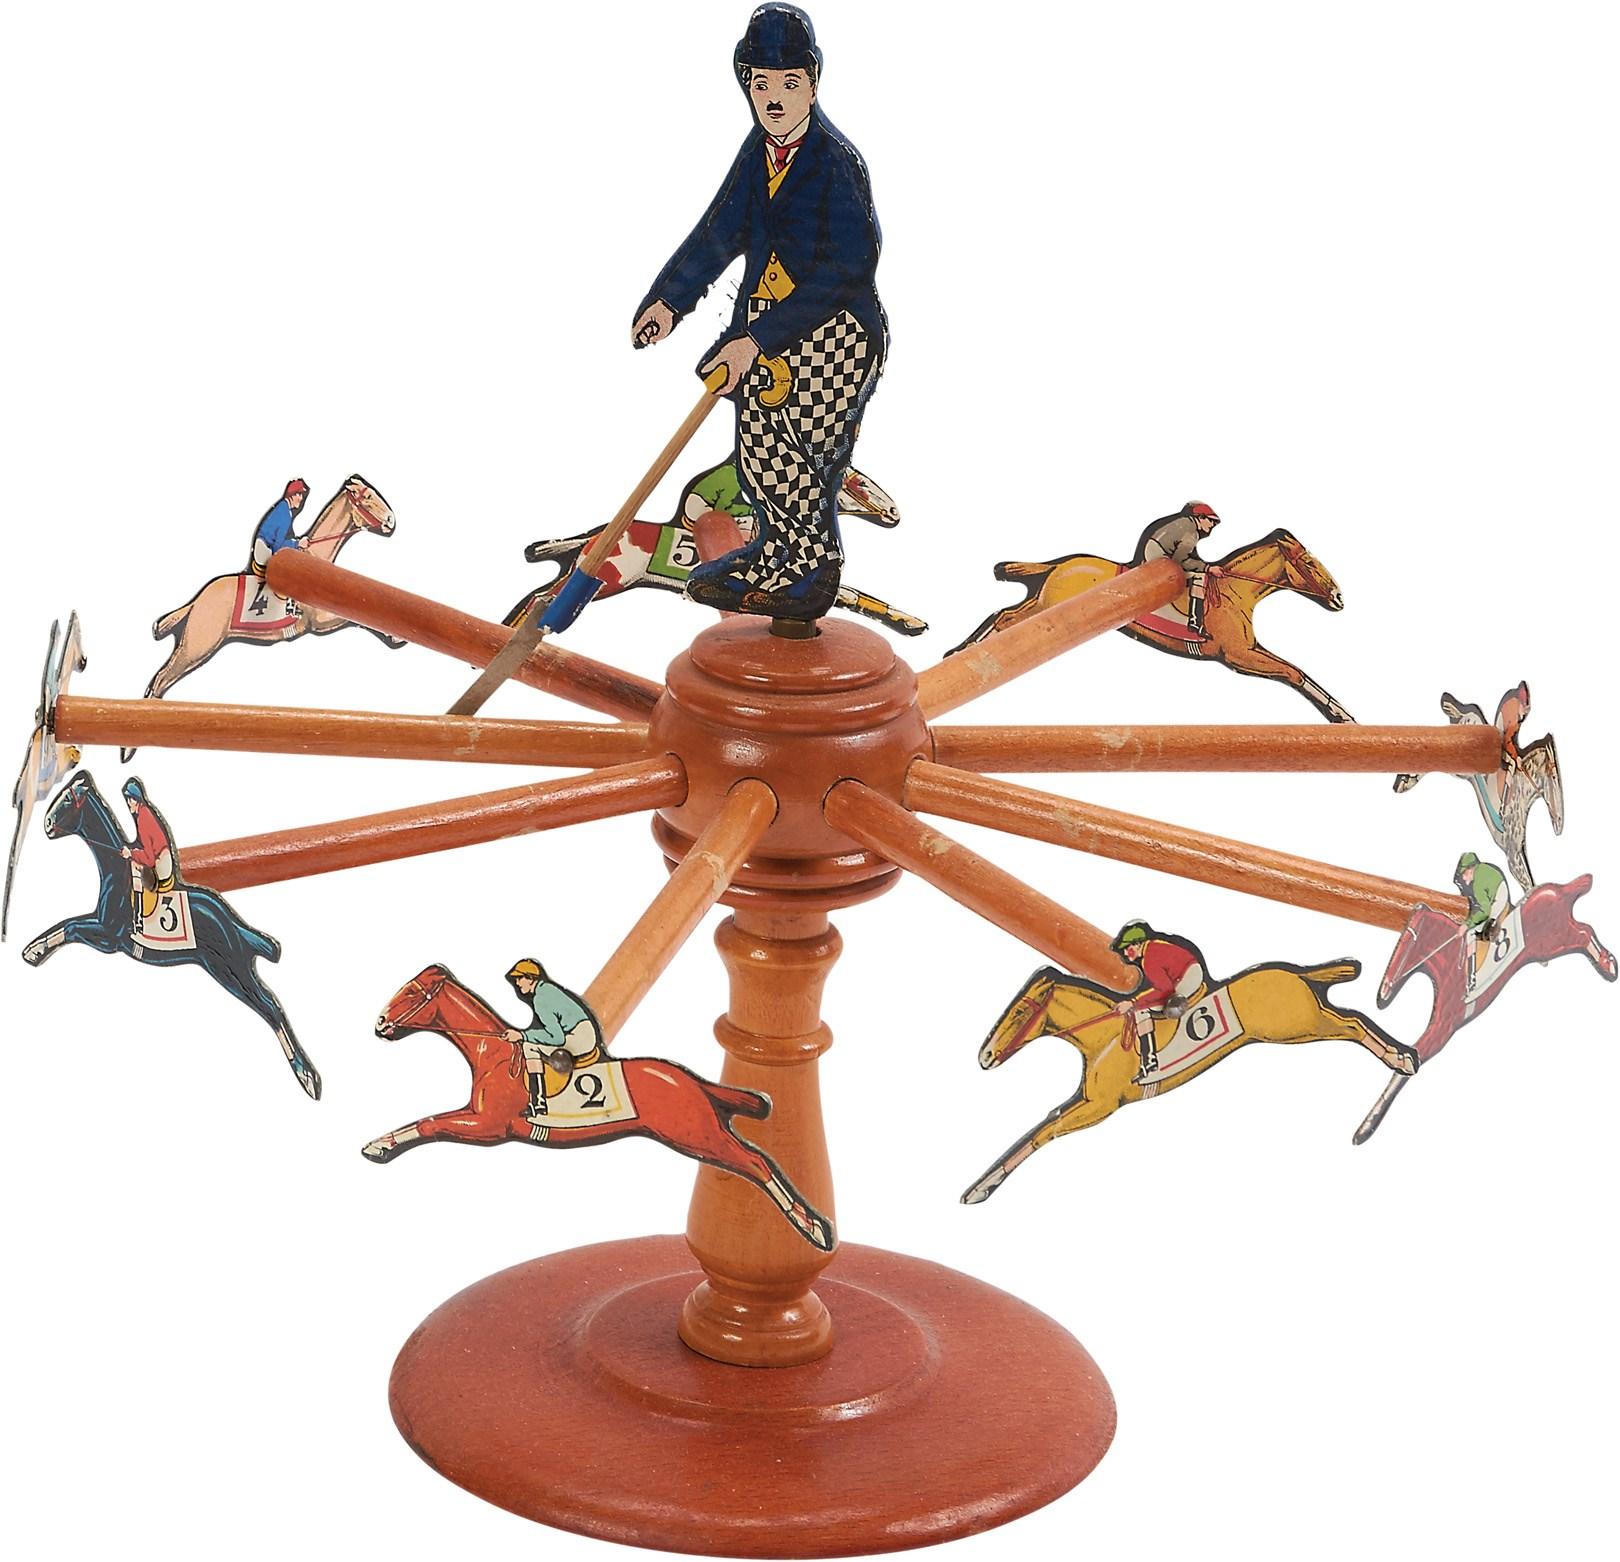 S Charlie Chaplin Eureka Horse Racing Game In